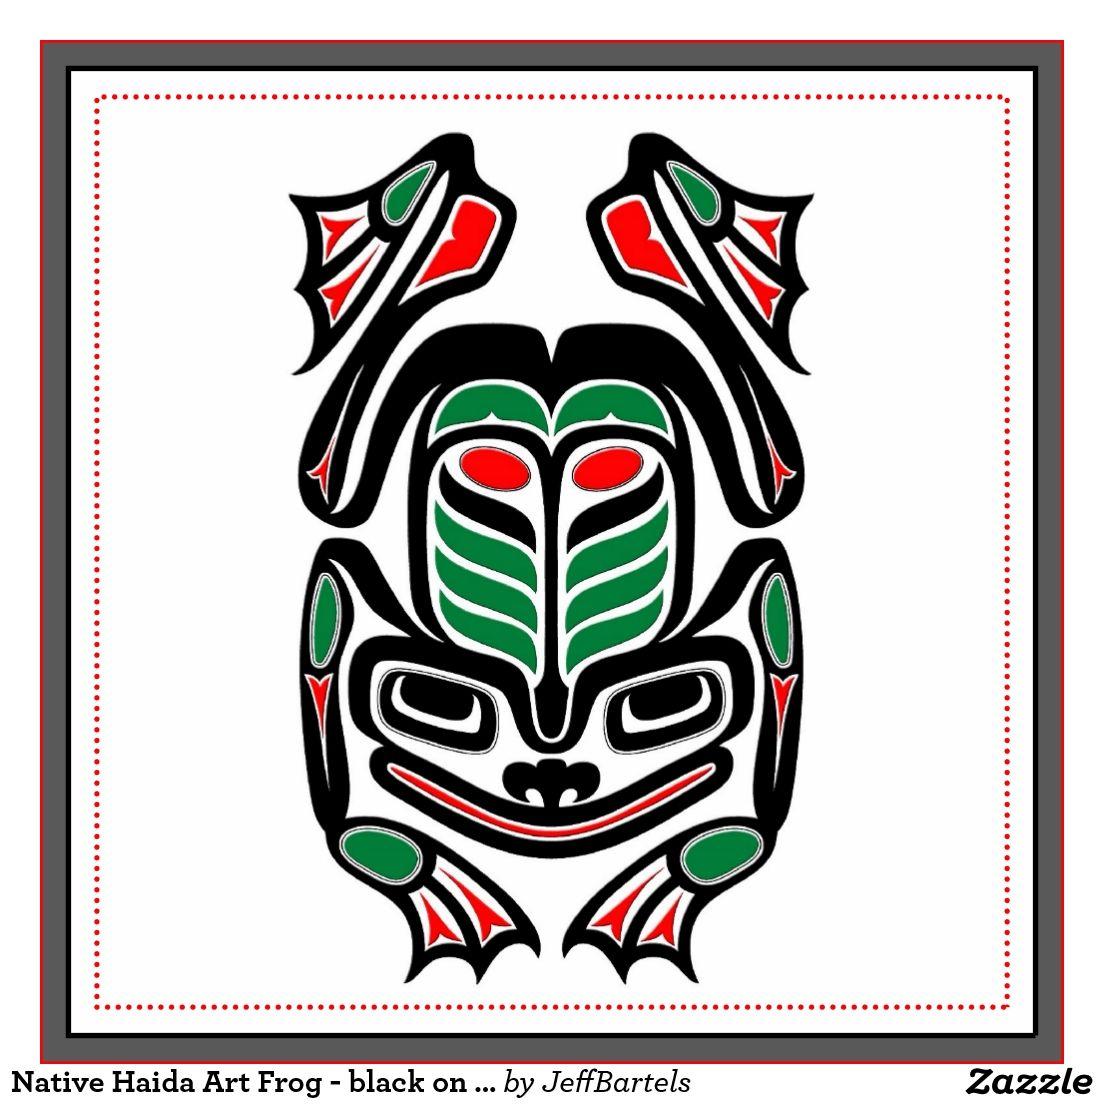 Native haida art frog black on white tile haida art frogs and native haida art frog black on white ceramic tile zazzle dailygadgetfo Gallery